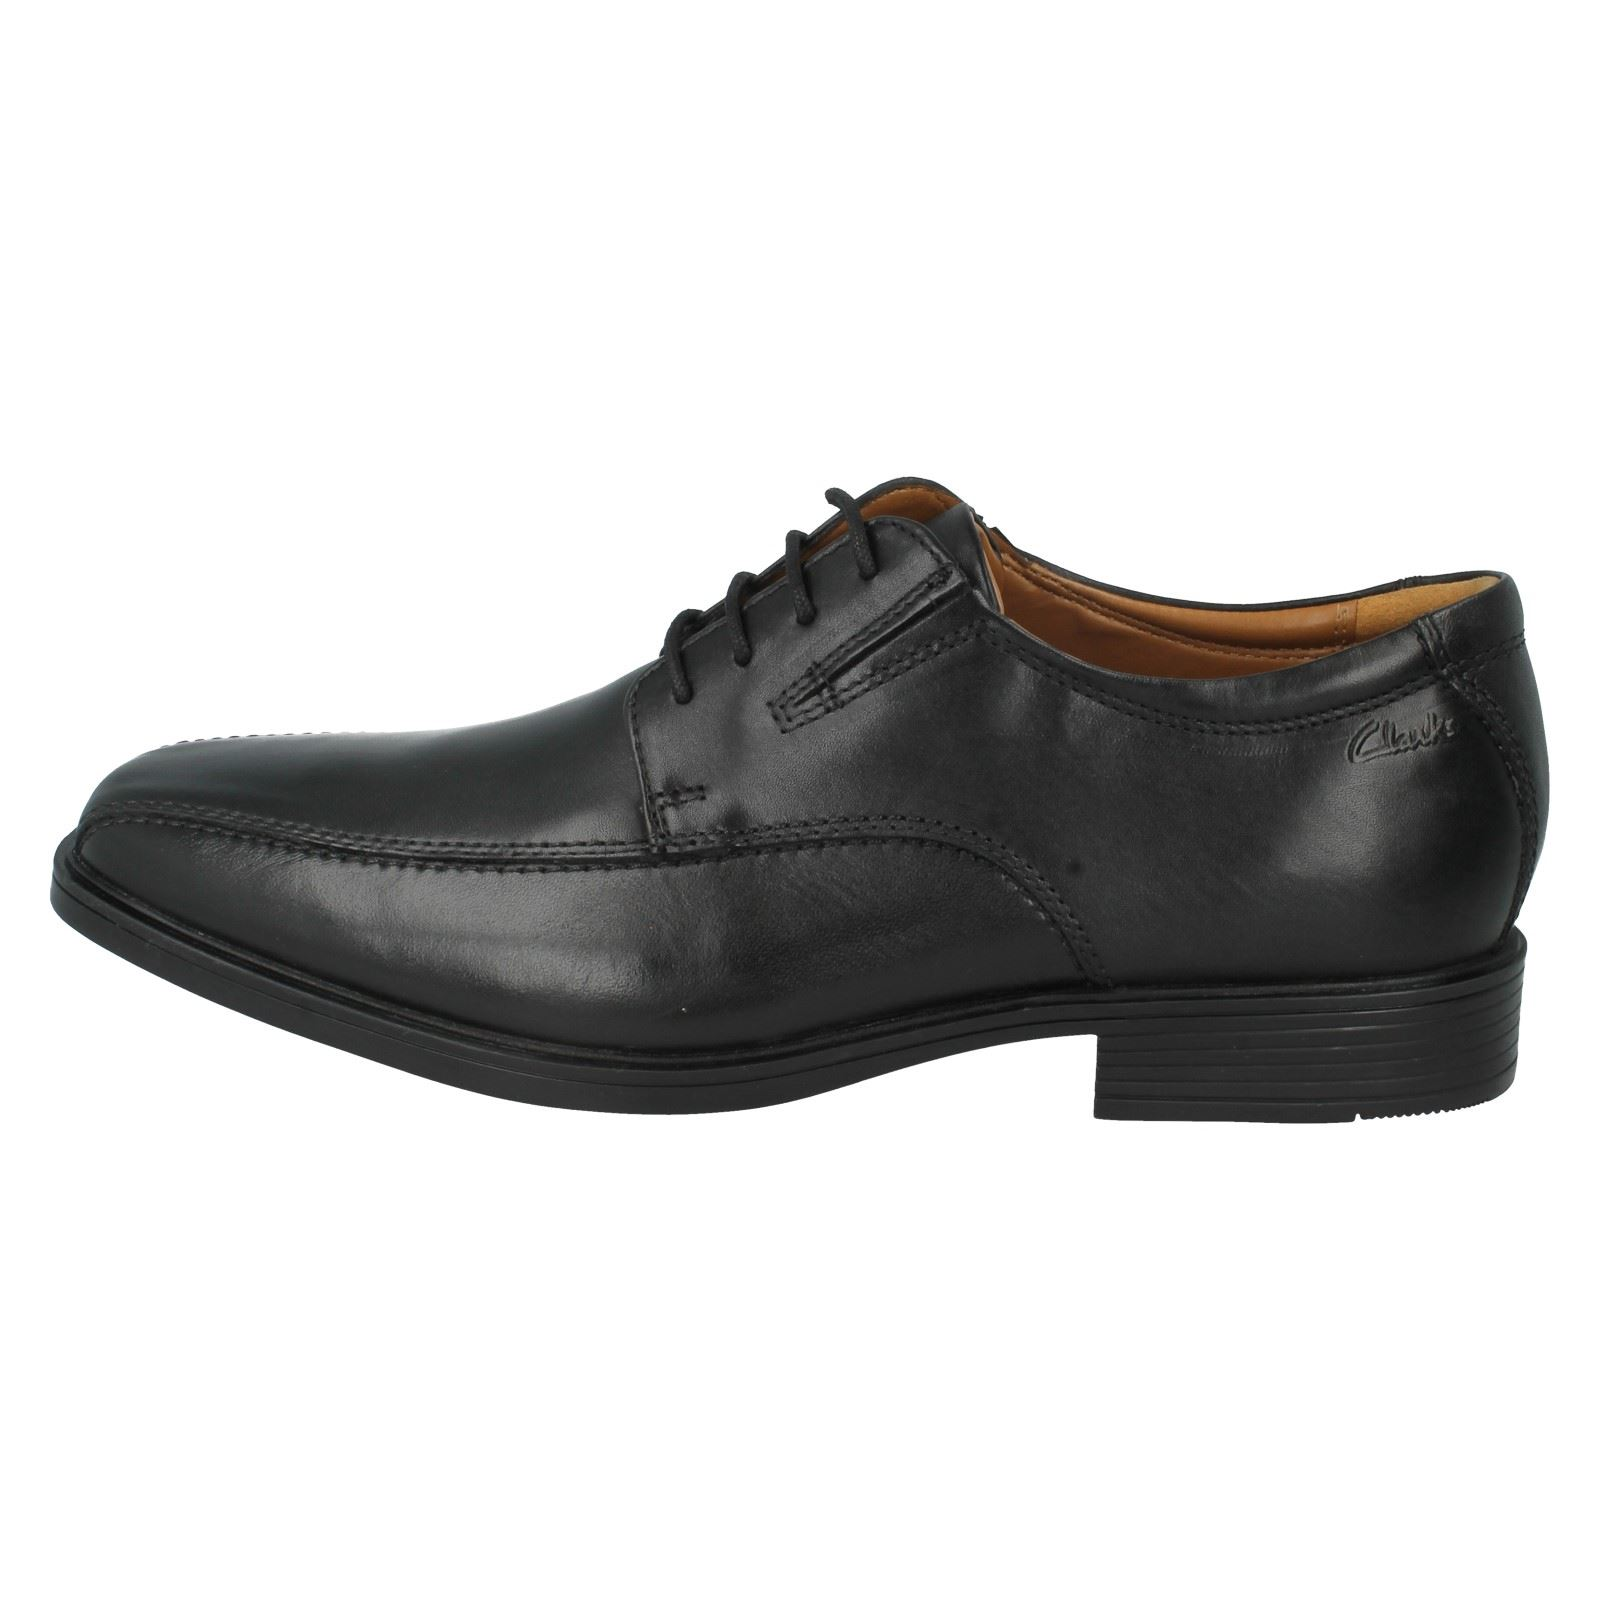 Men's Clarks Formal Lace Up Shoes The Style - Tilden Walk